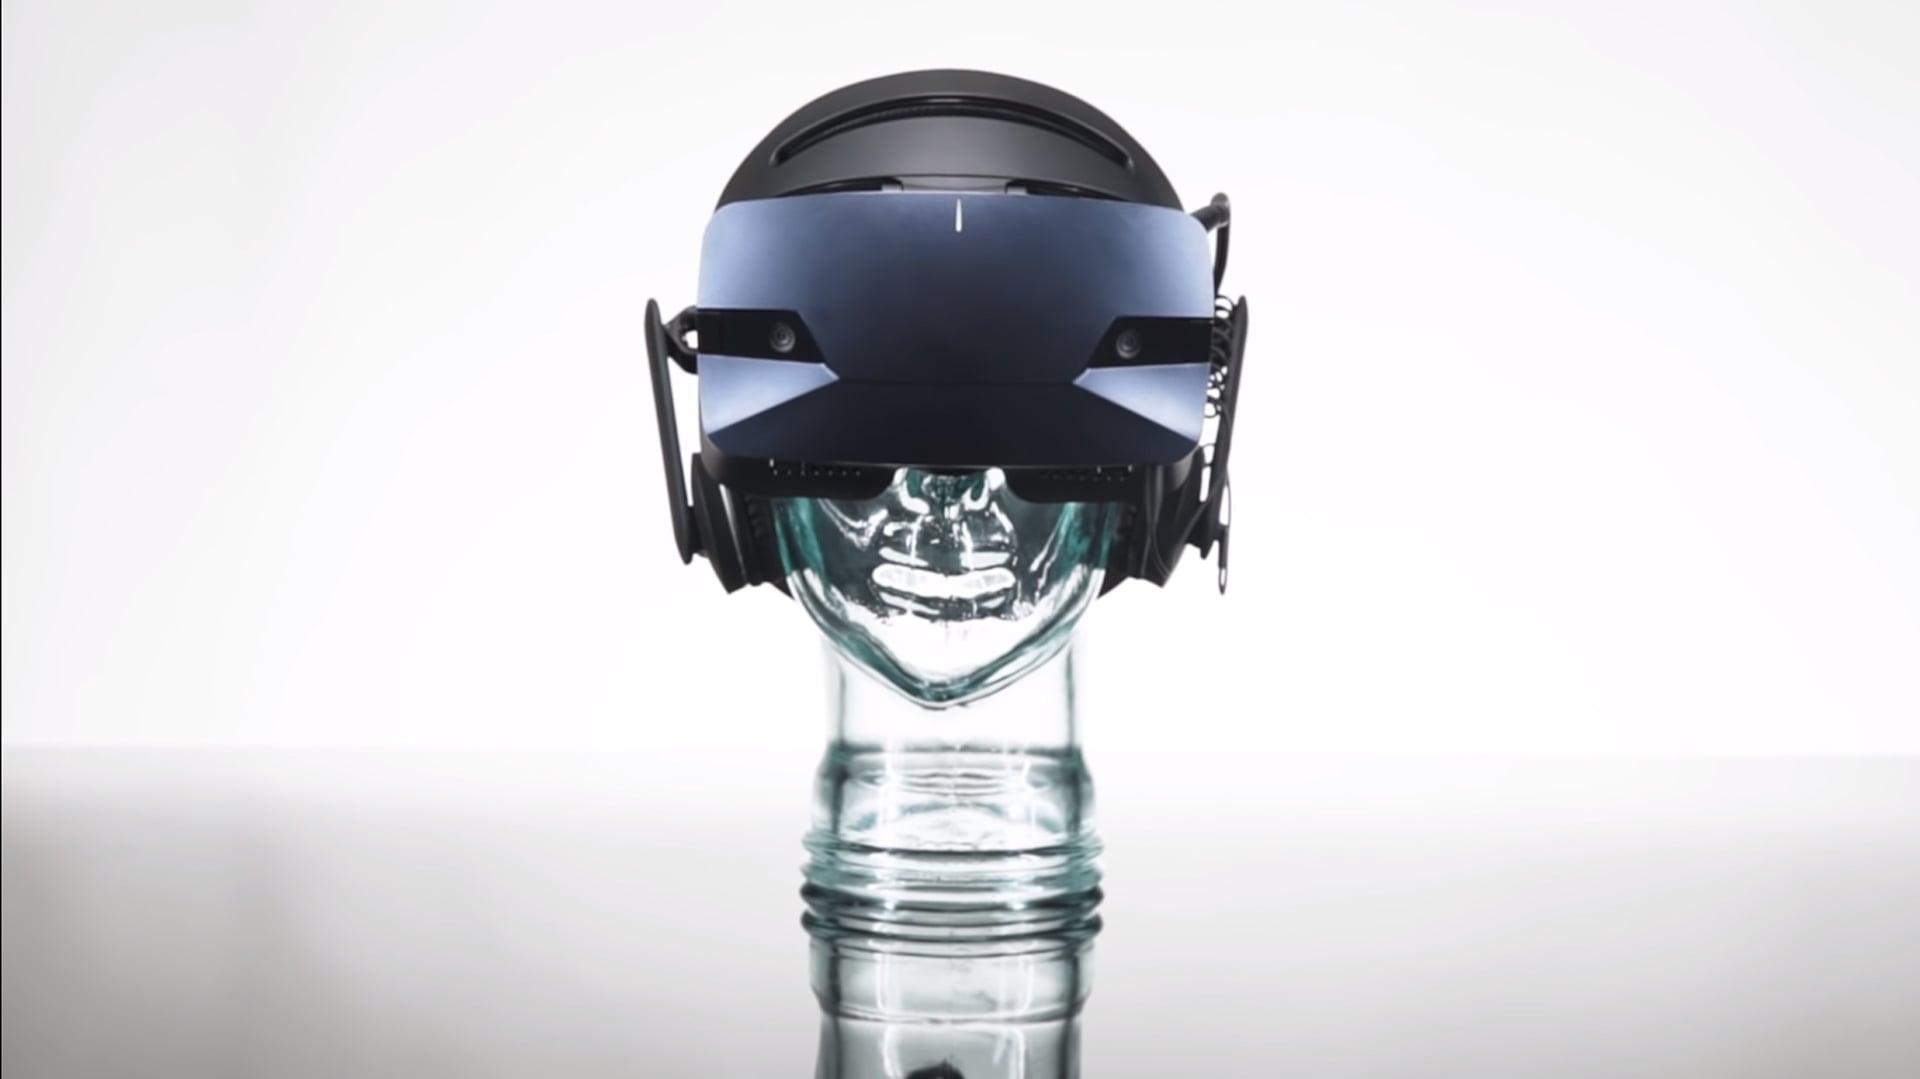 Acer OJO 500 Detachable Mixed Reality Headset